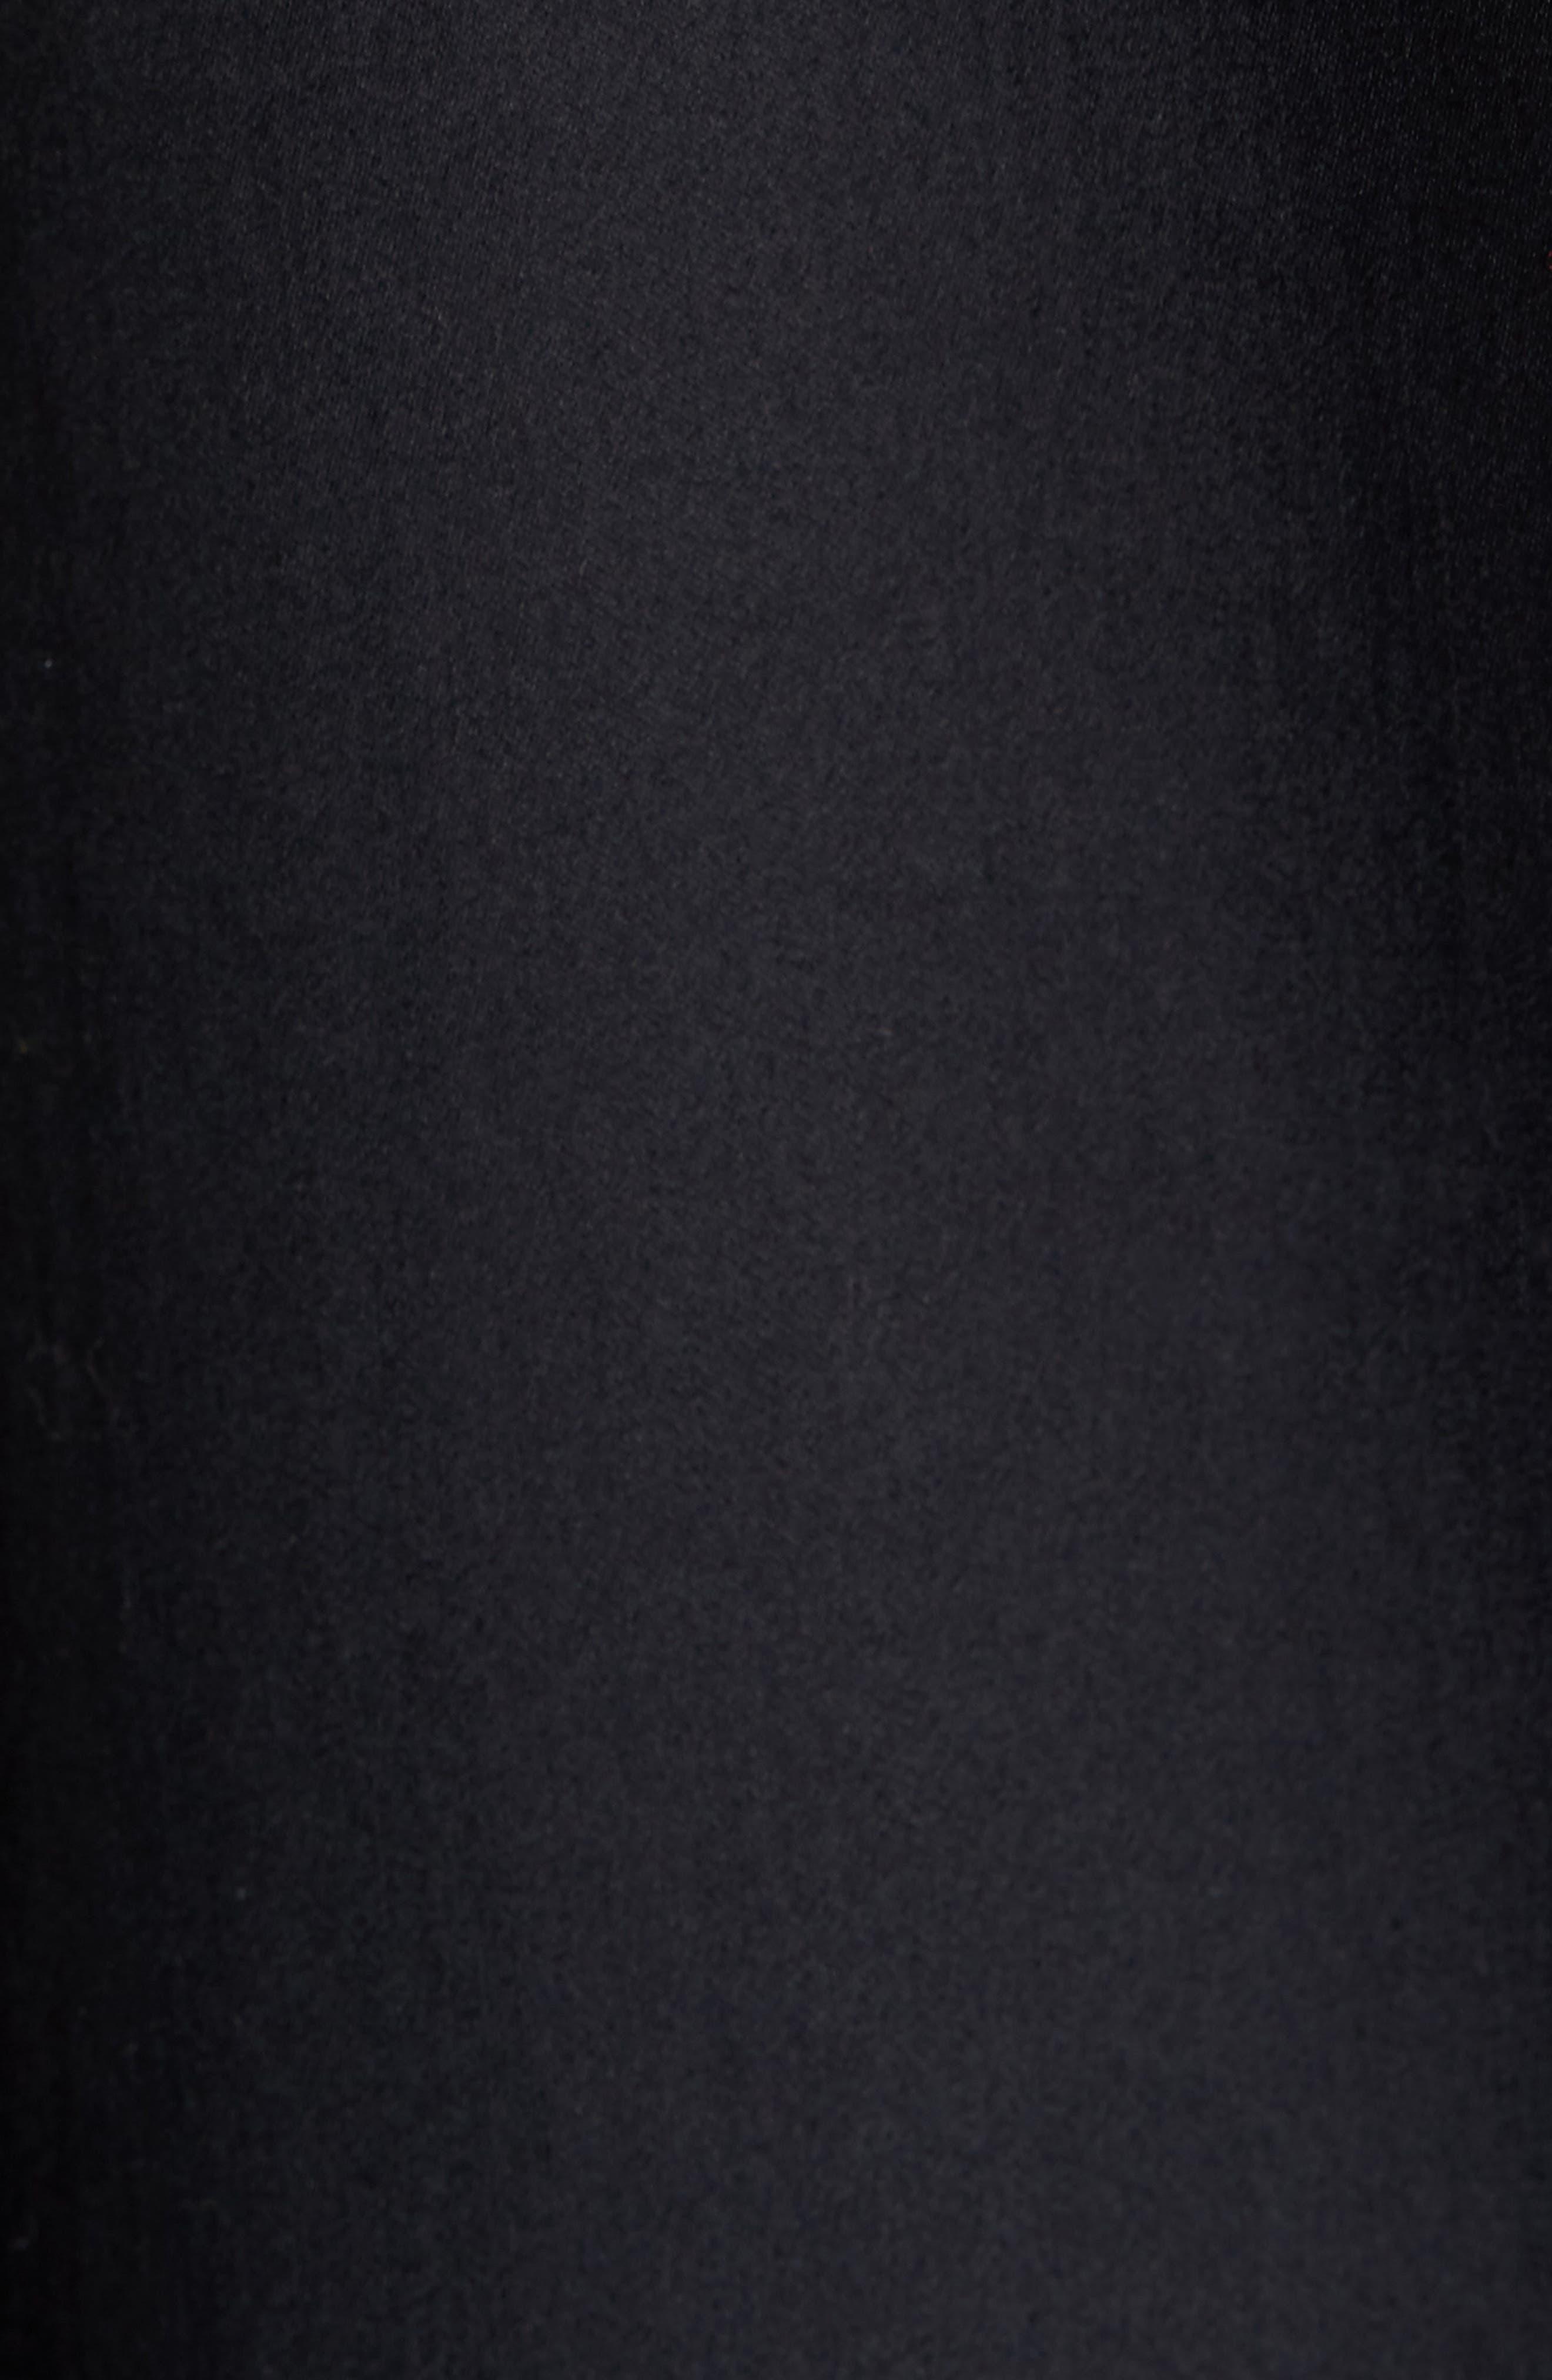 Contrast Trim Shirtdress,                             Alternate thumbnail 5, color,                             Black/ White